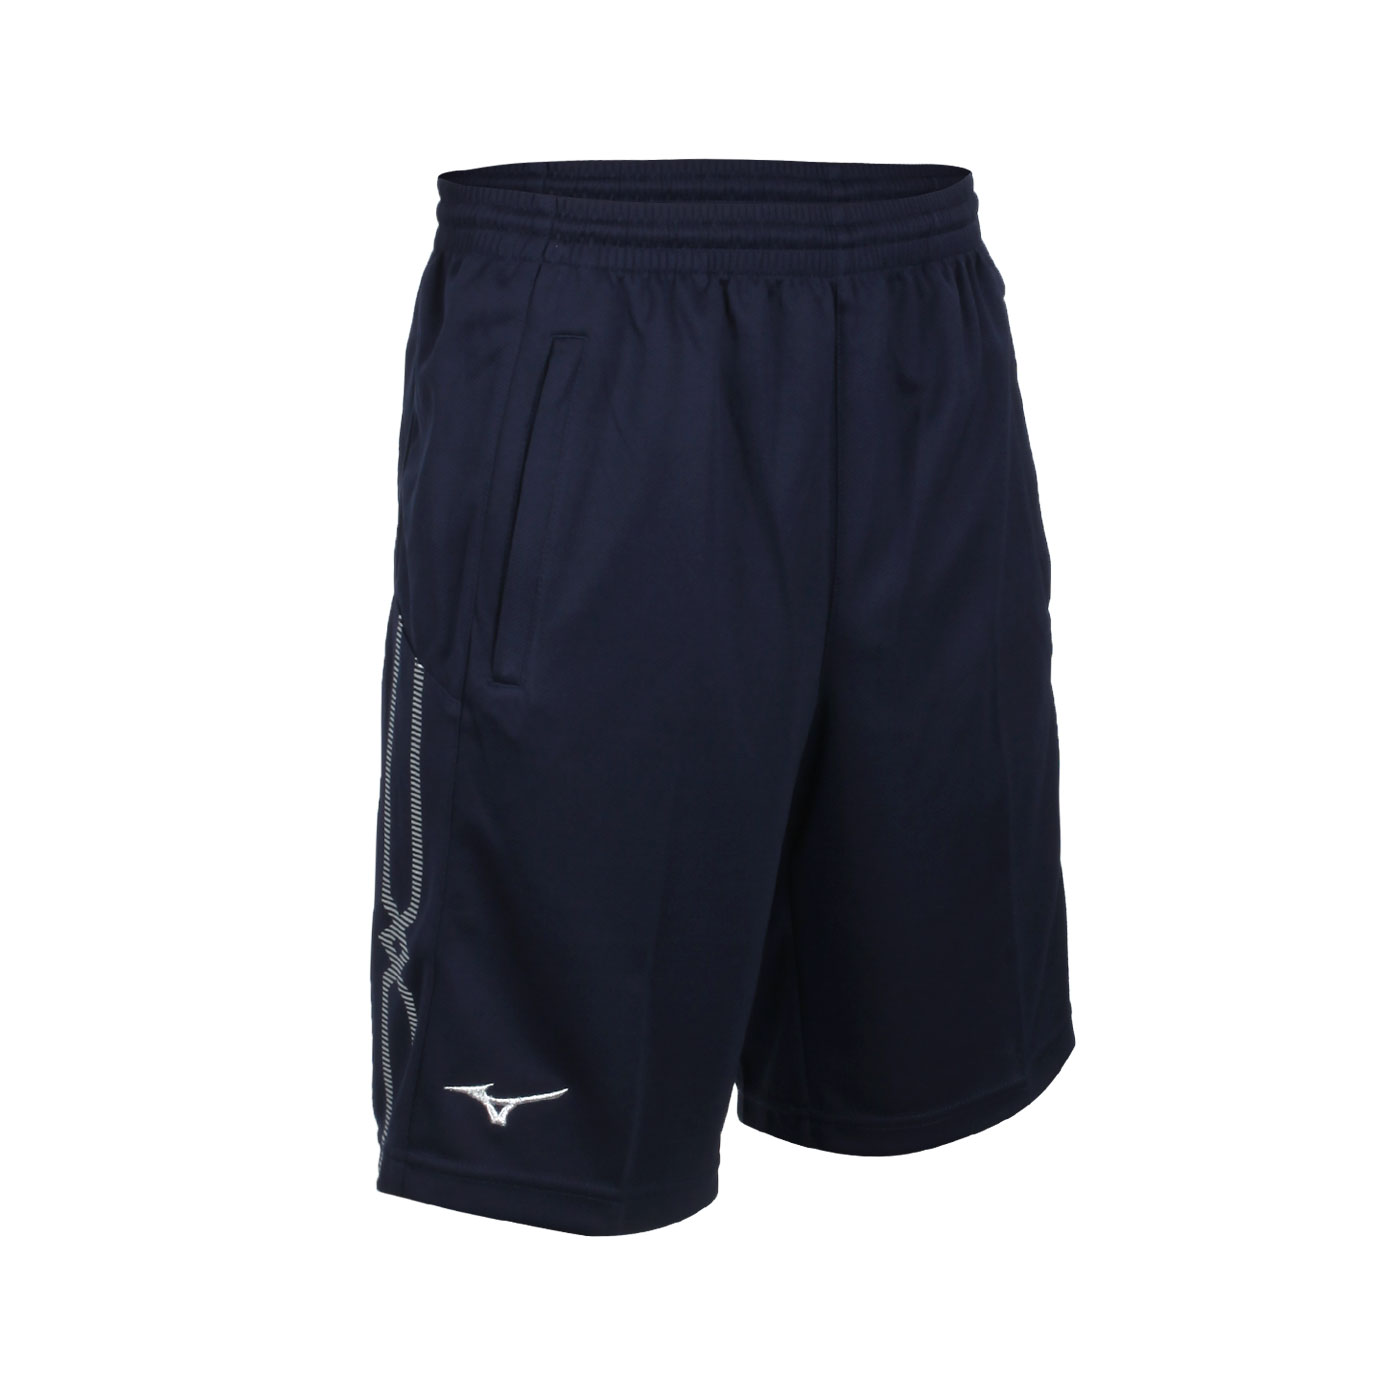 MIZUNO 男款針織短褲 32TB153214 - 丈青白